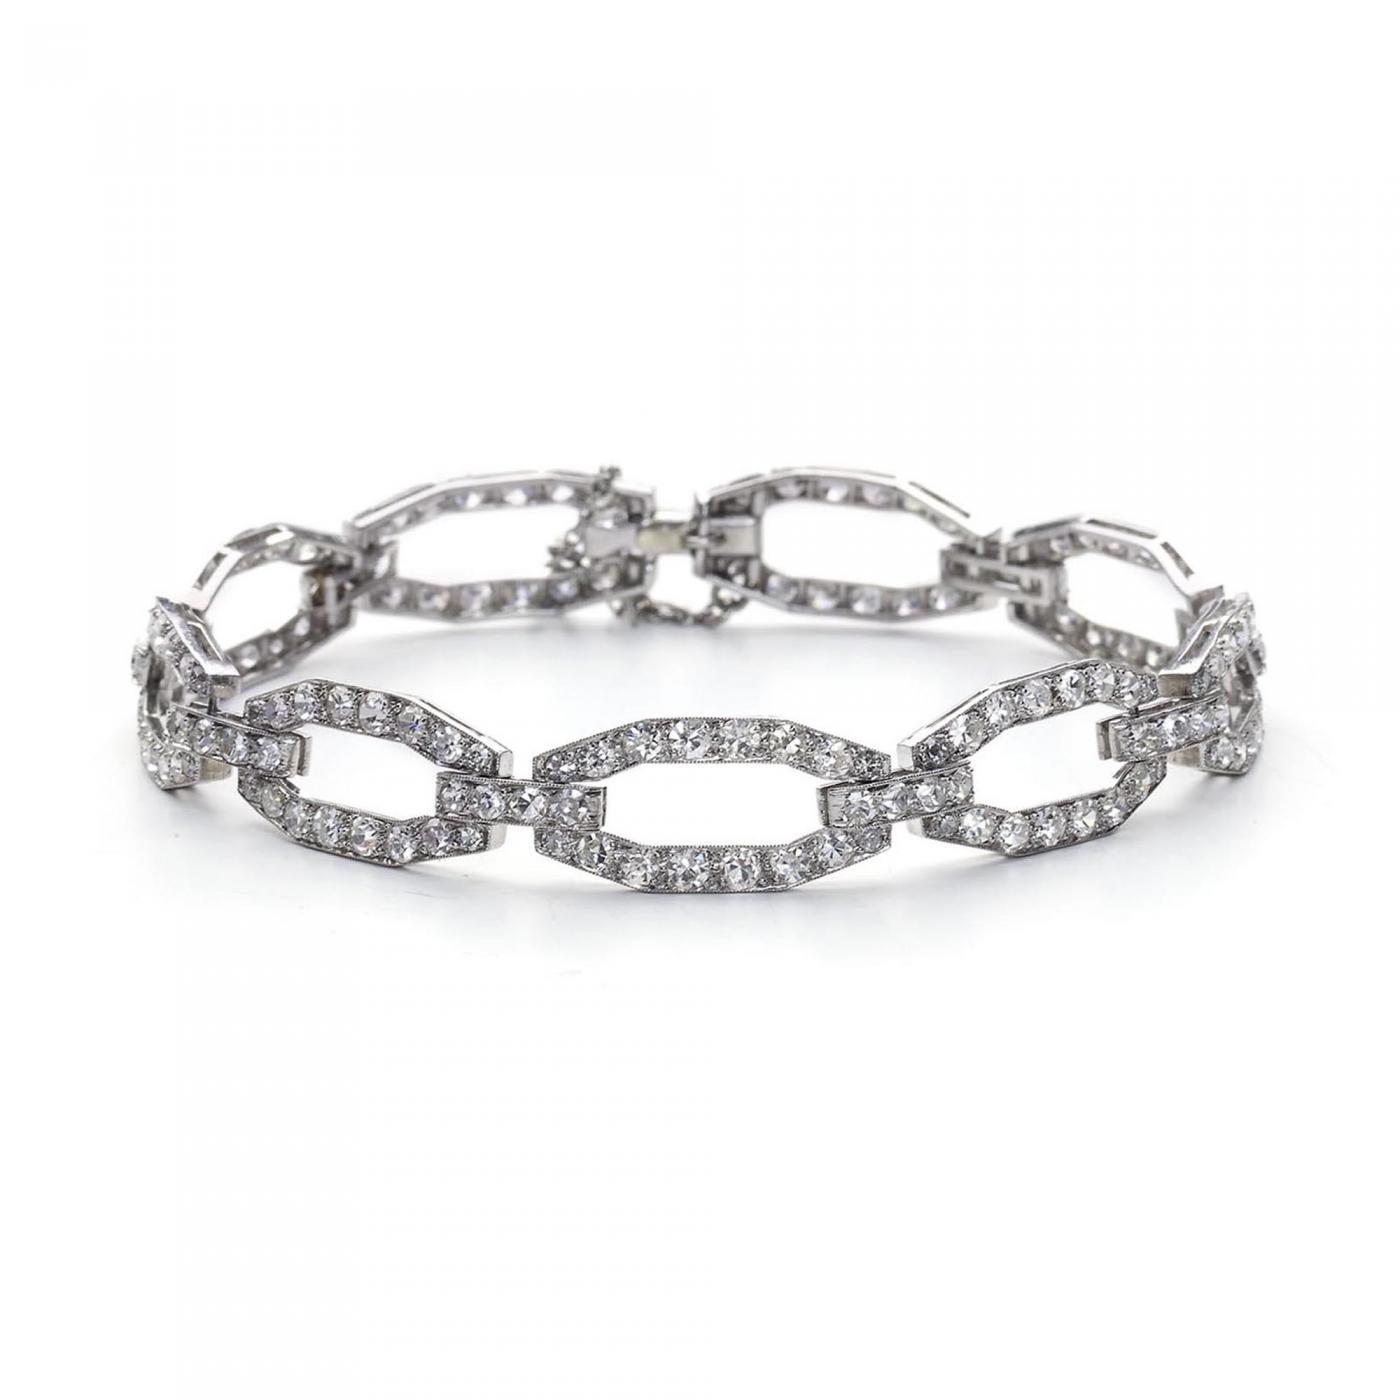 Boucheron Boucheron Art Deco Diamond Platinum Link Bracelet